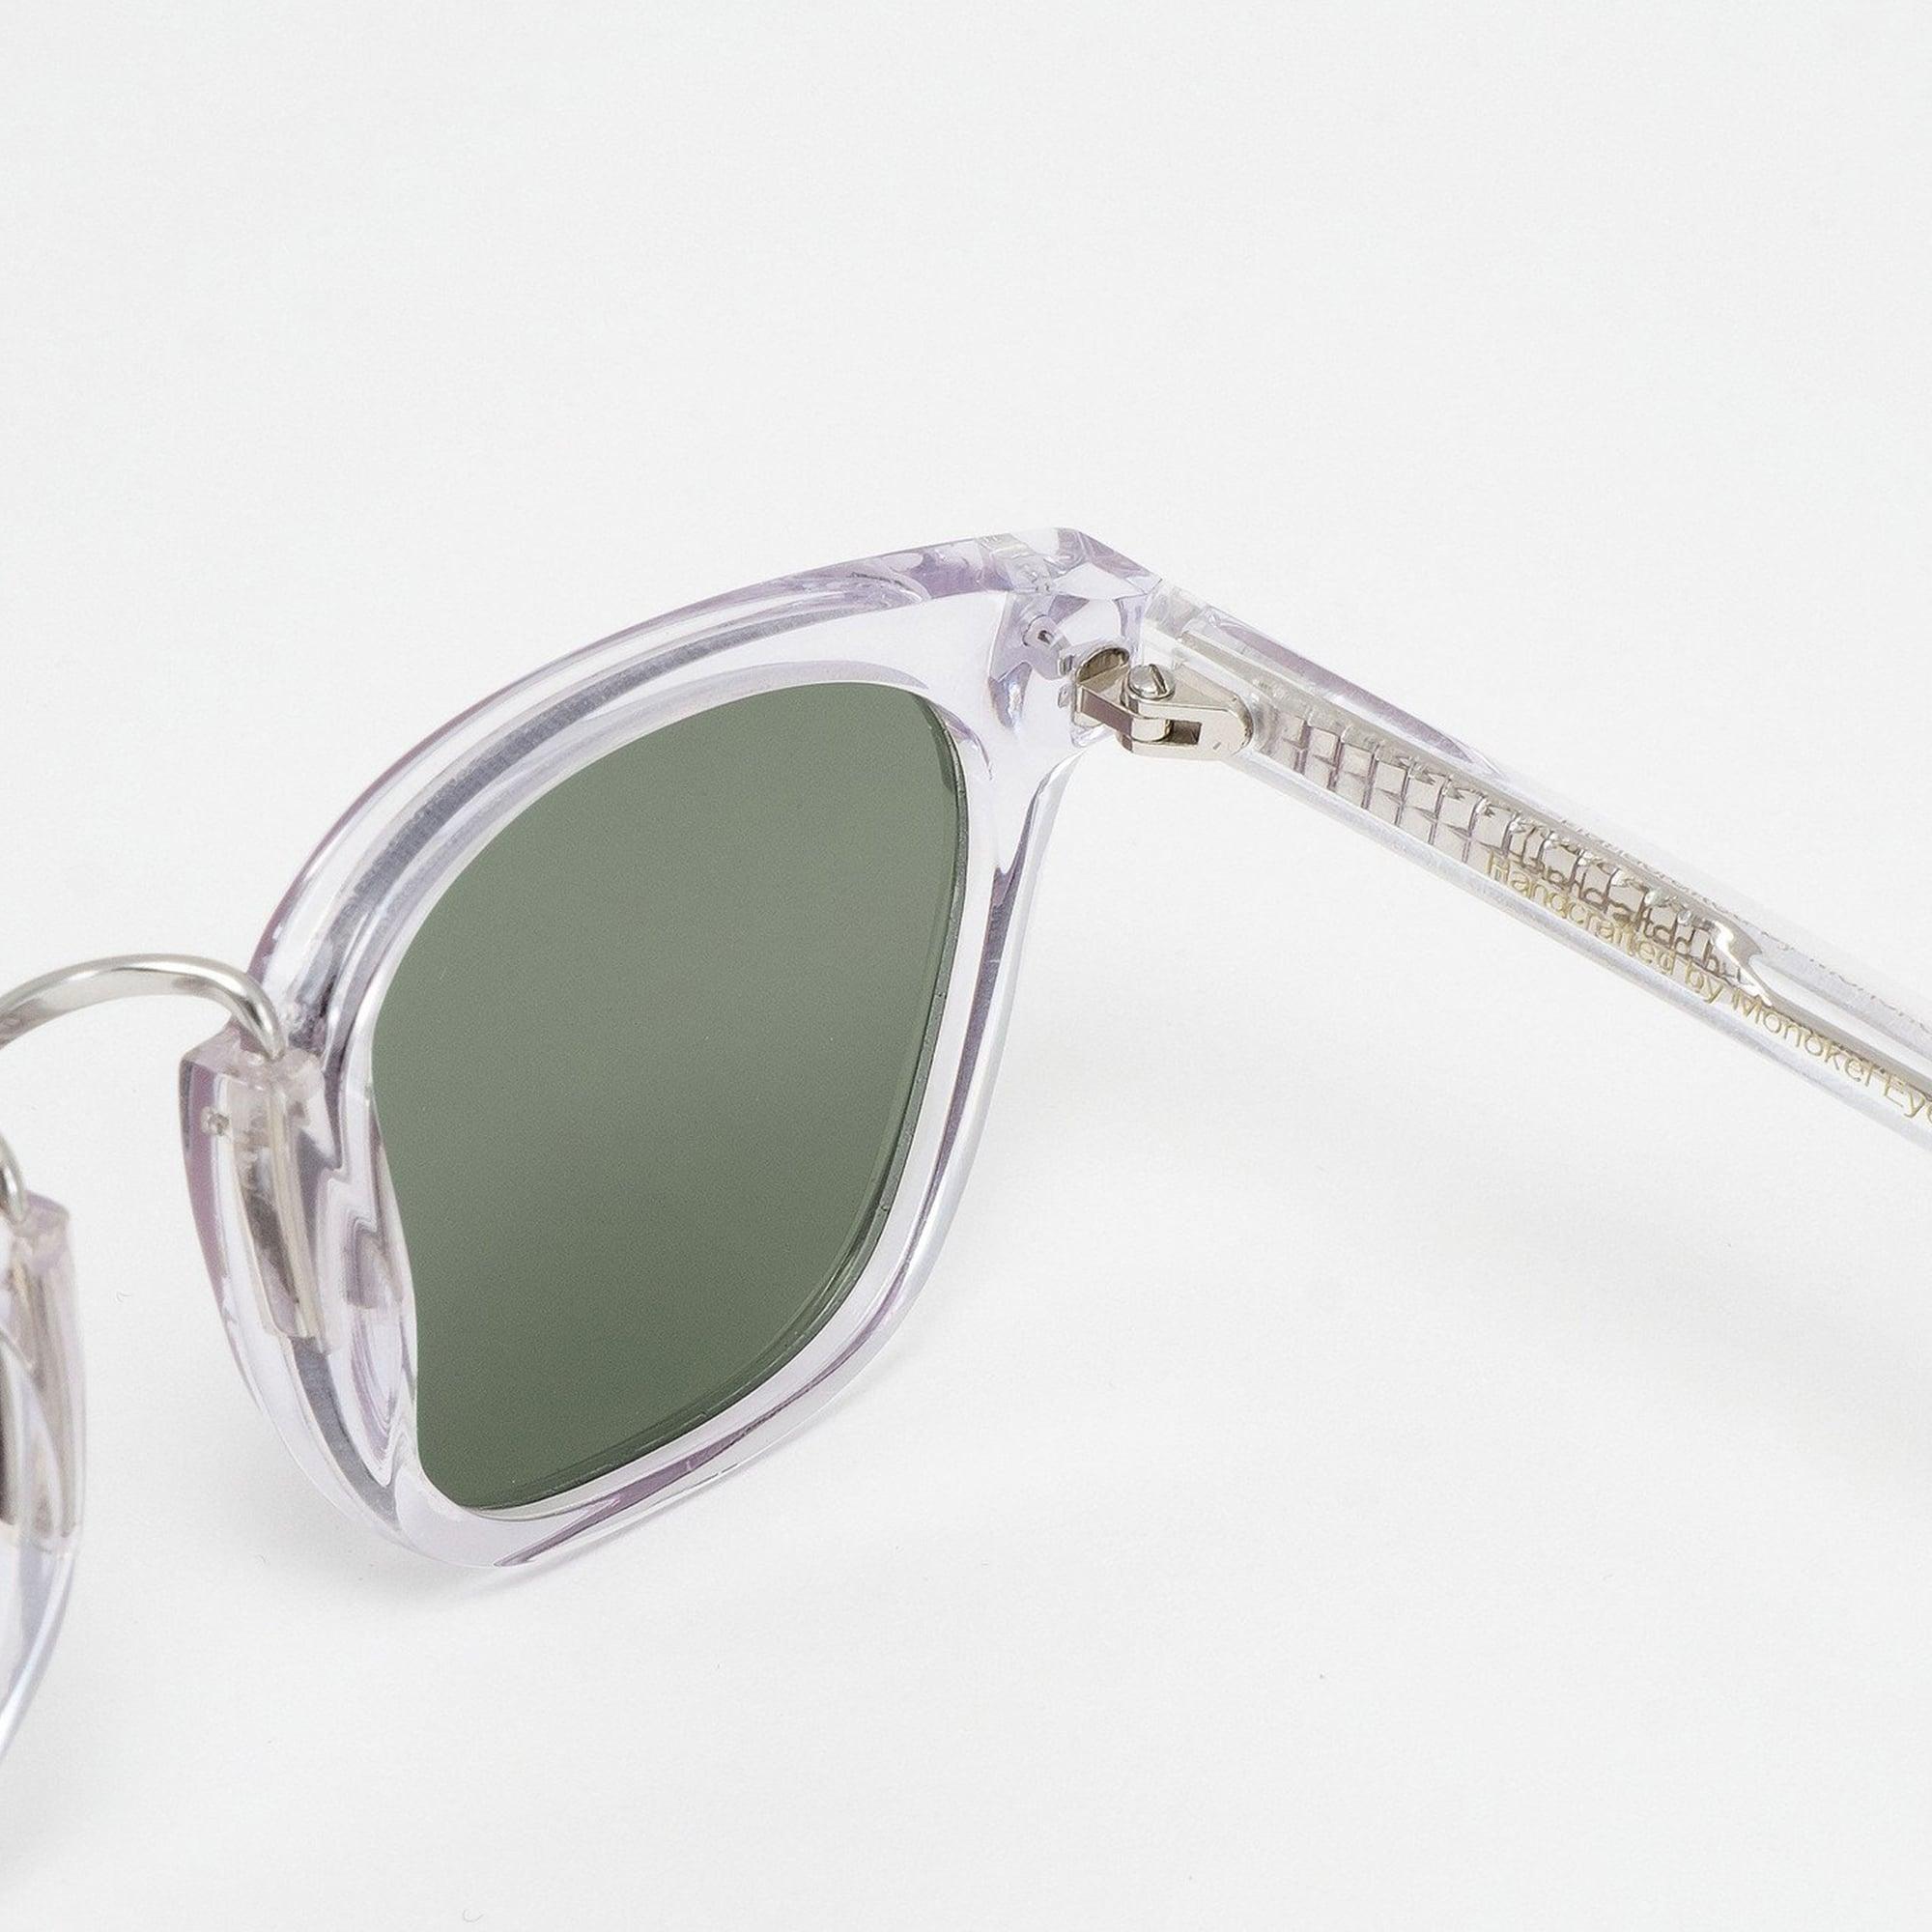 d719c8b9a45 Monokel Eyewear Ando Sunglasses